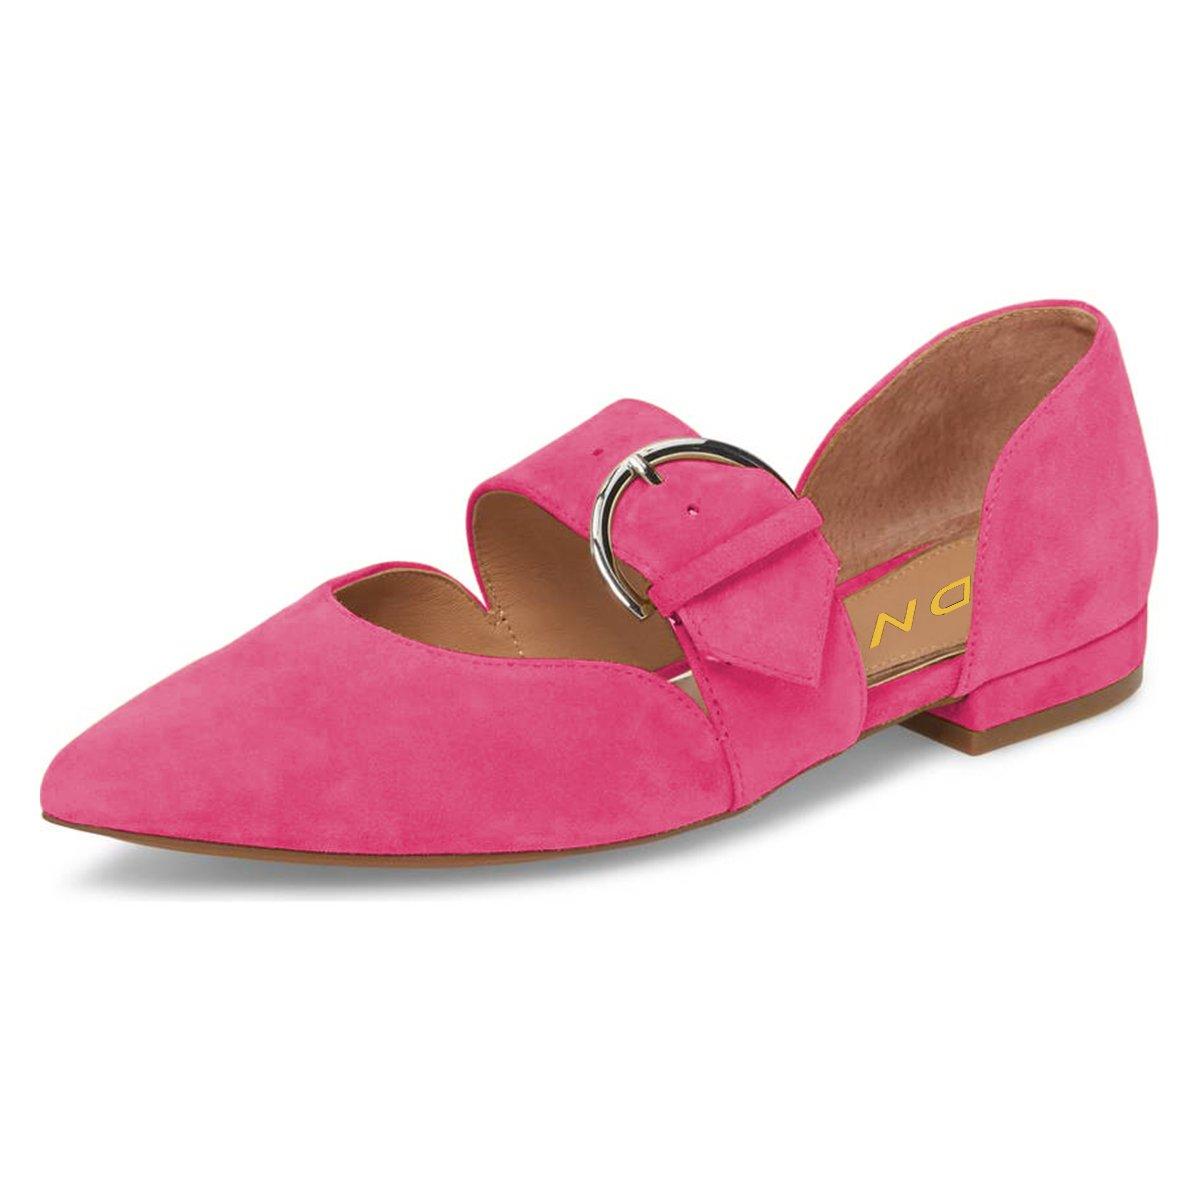 YDN Women's Pointed Toe Mary Jane Flats Slip On D'Orsay Pumps Low Heels Office Shoes B07B4GB5DV 4 B(M) US|Fuchsia